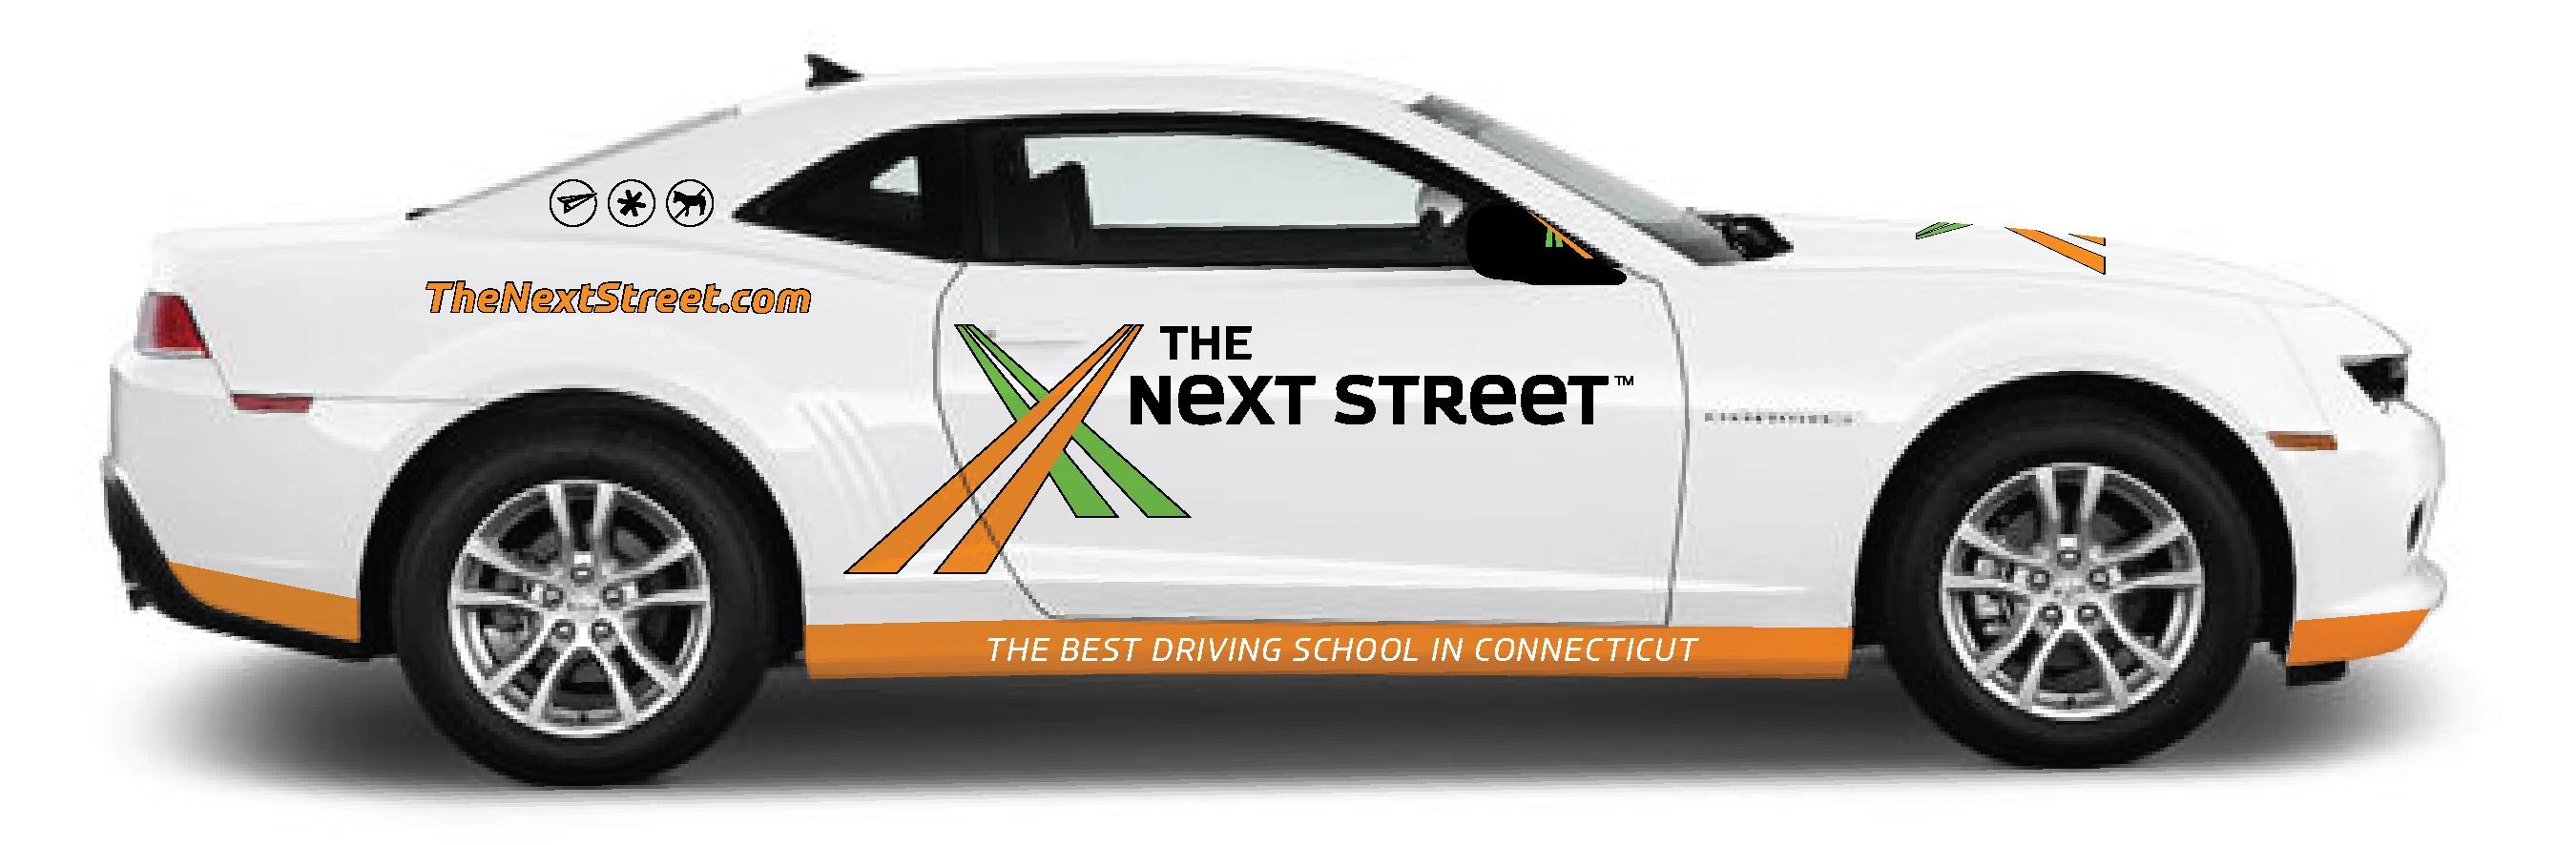 the_next_street_vehicle_design_reverse_side_view.jpg